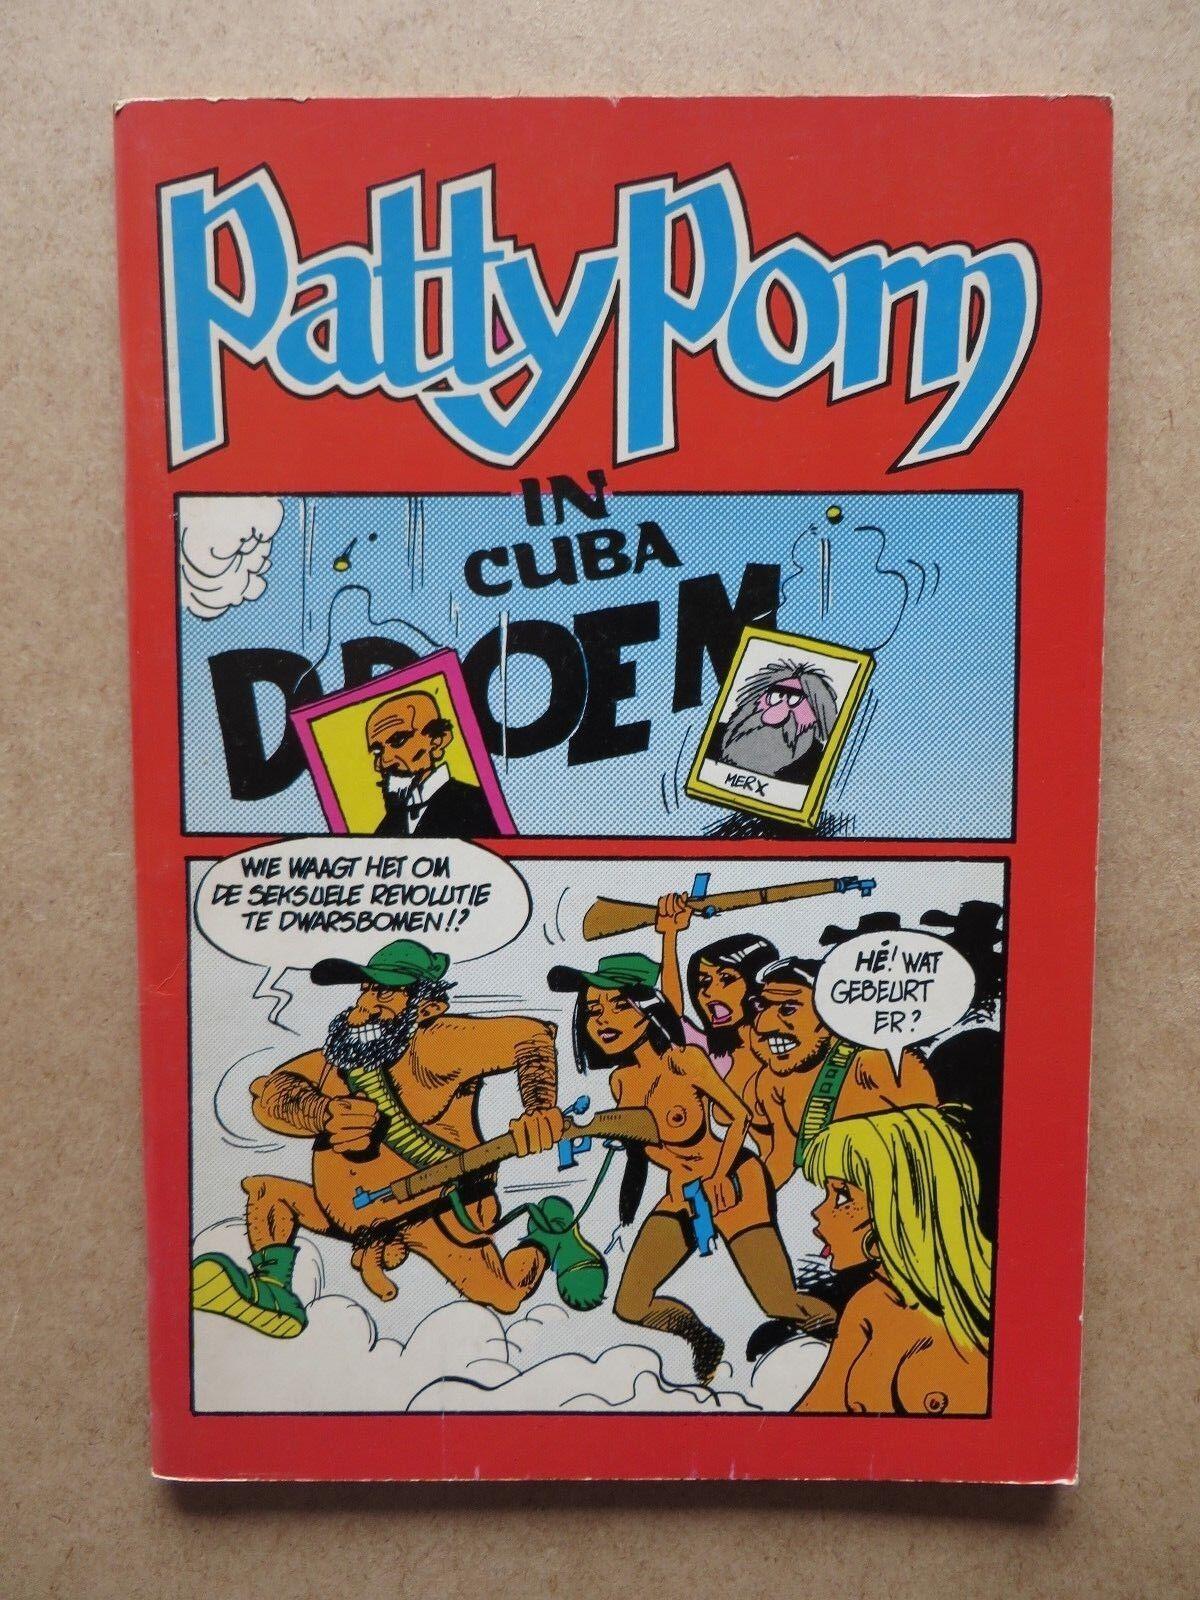 Patty Porn in Cuba - 1ste druk 1983 - zeer mooi - EROTIEK !!!